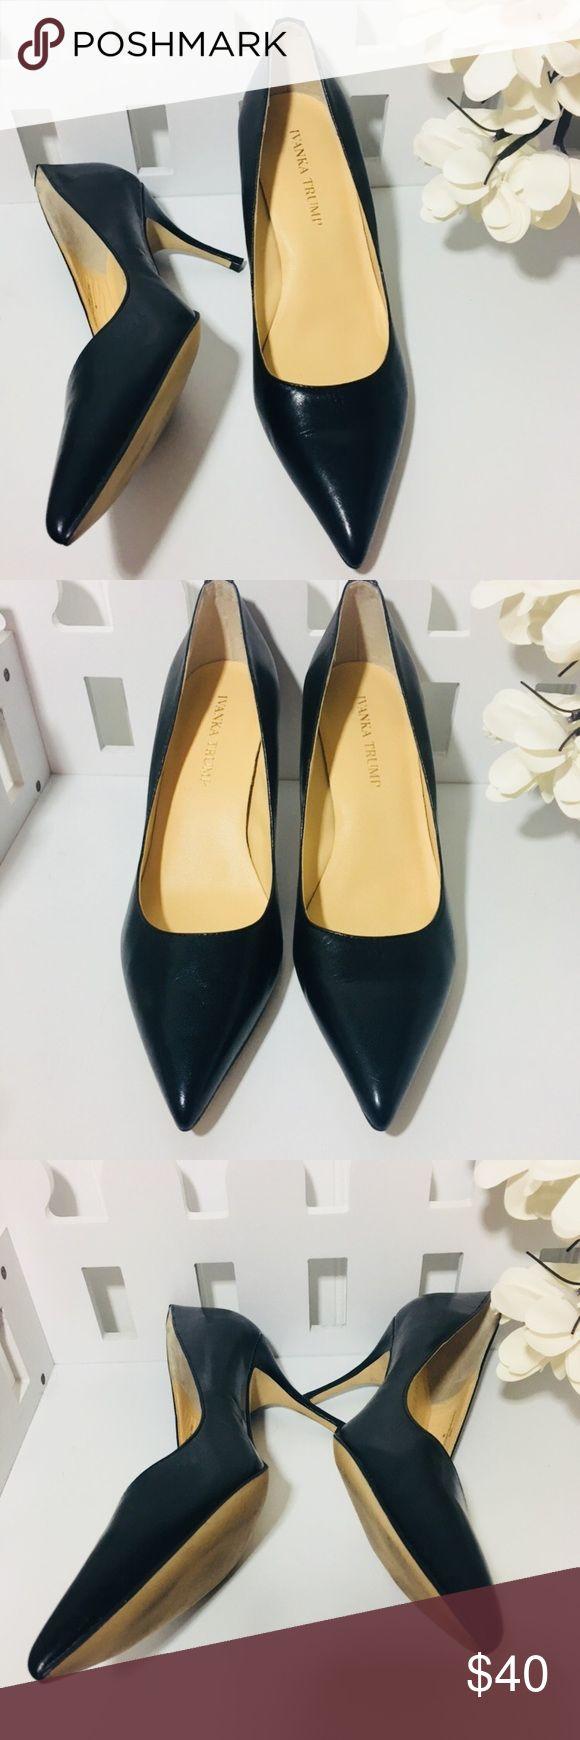 "Ivanka Trum Black Boni pointy toe pumps size 8 Ivanka Trum Black 'Boni' Leather, pointy toe, pumps size 8. In great condition. Heel is 3"" tall. Ivanka Trump Shoes Heels"